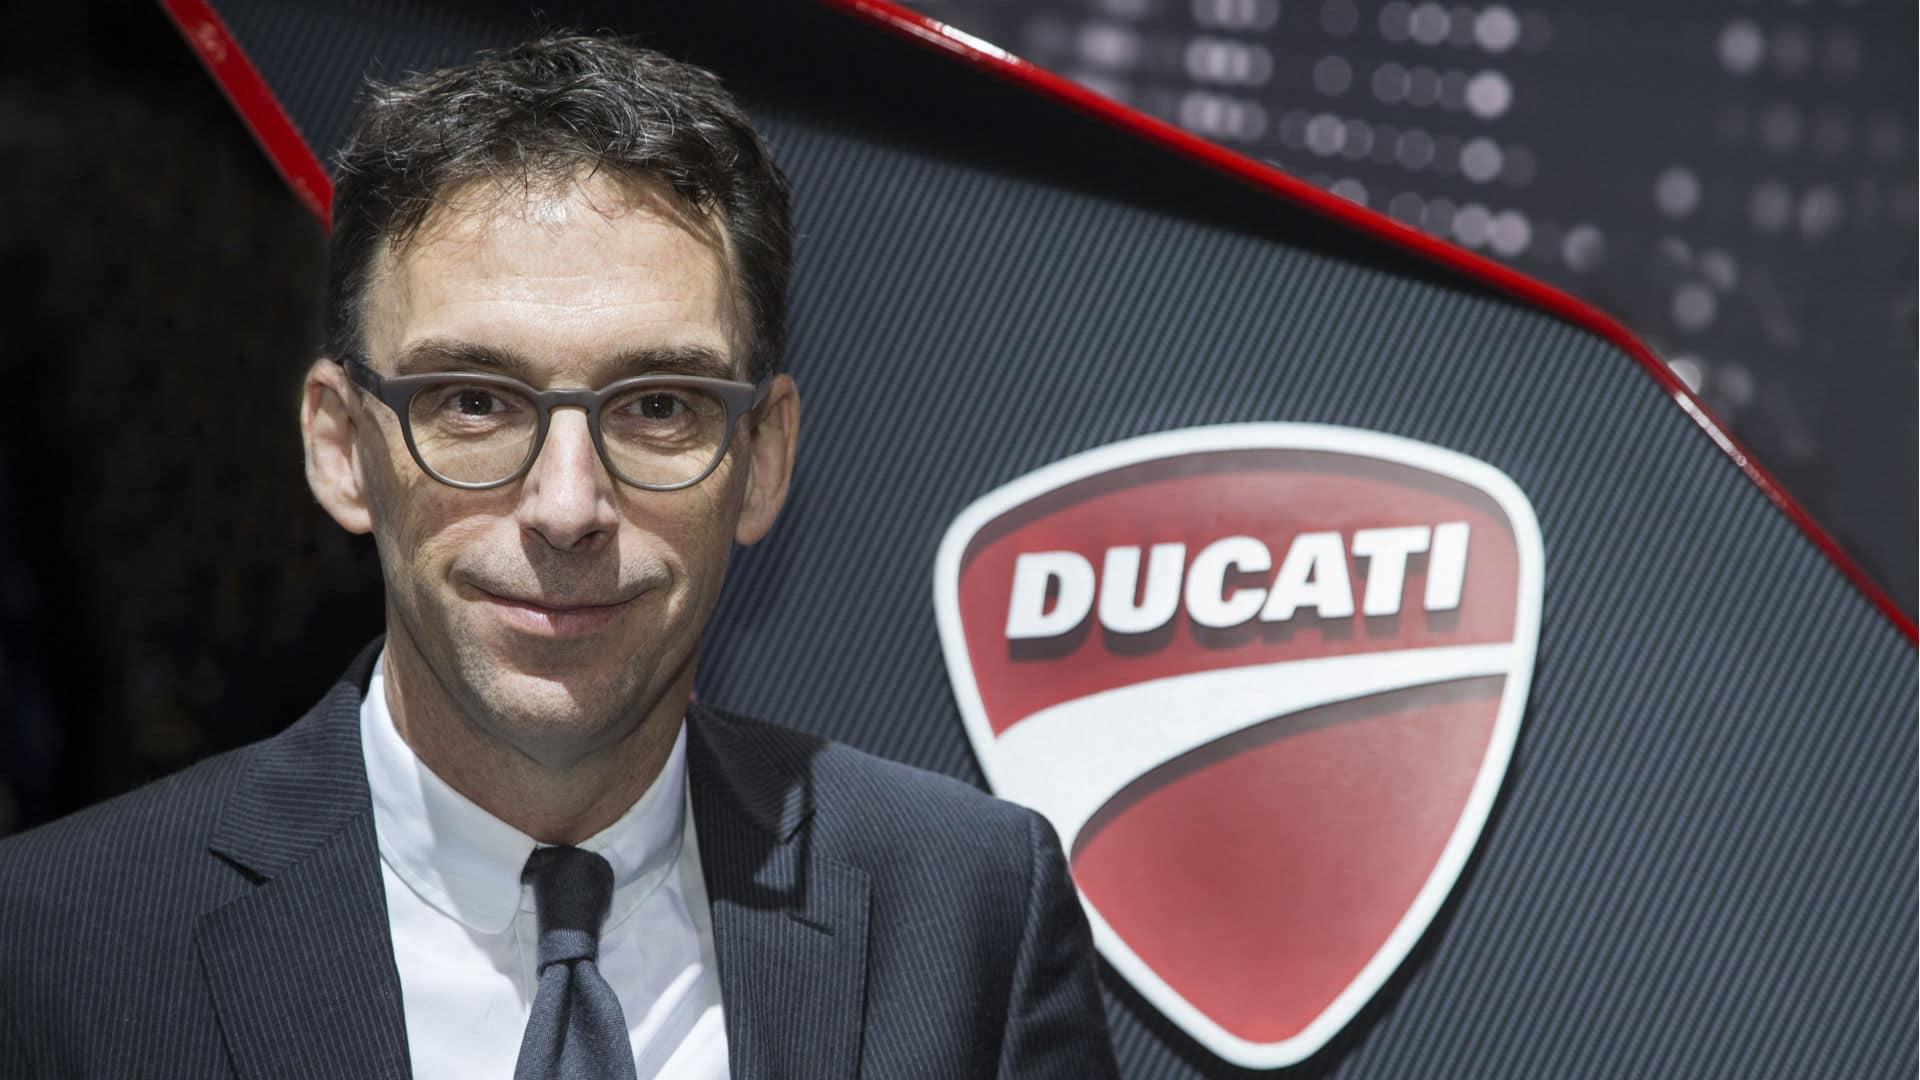 André Stoffels, CFO of Ducati Motor Holding